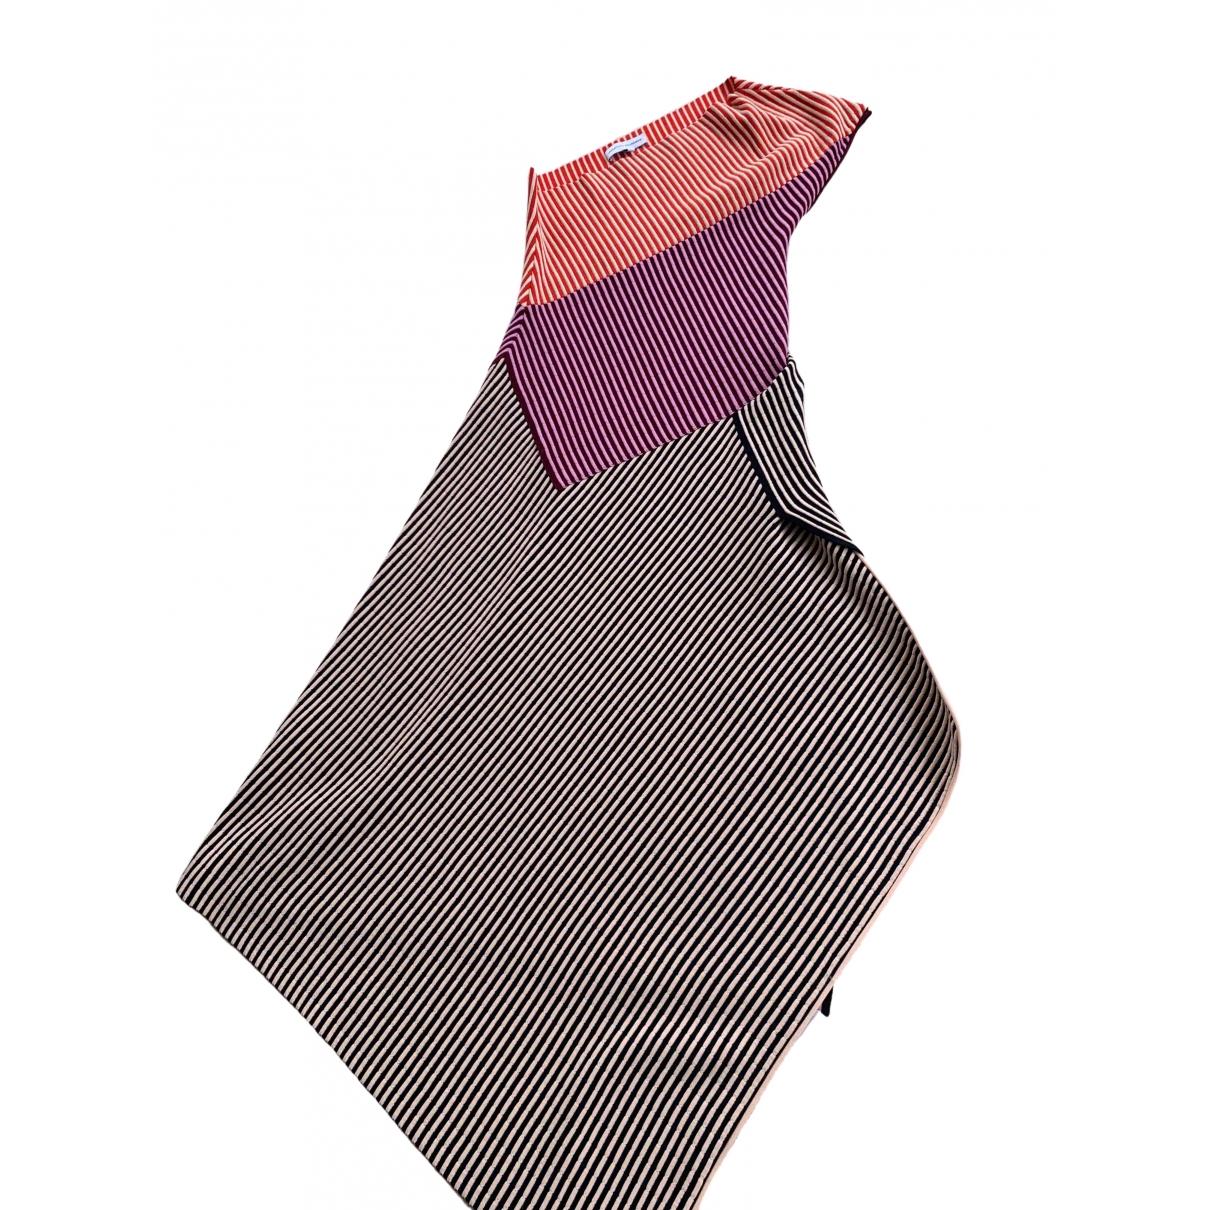 Jonathan Saunders - Robe   pour femme en coton - elasthane - multicolore